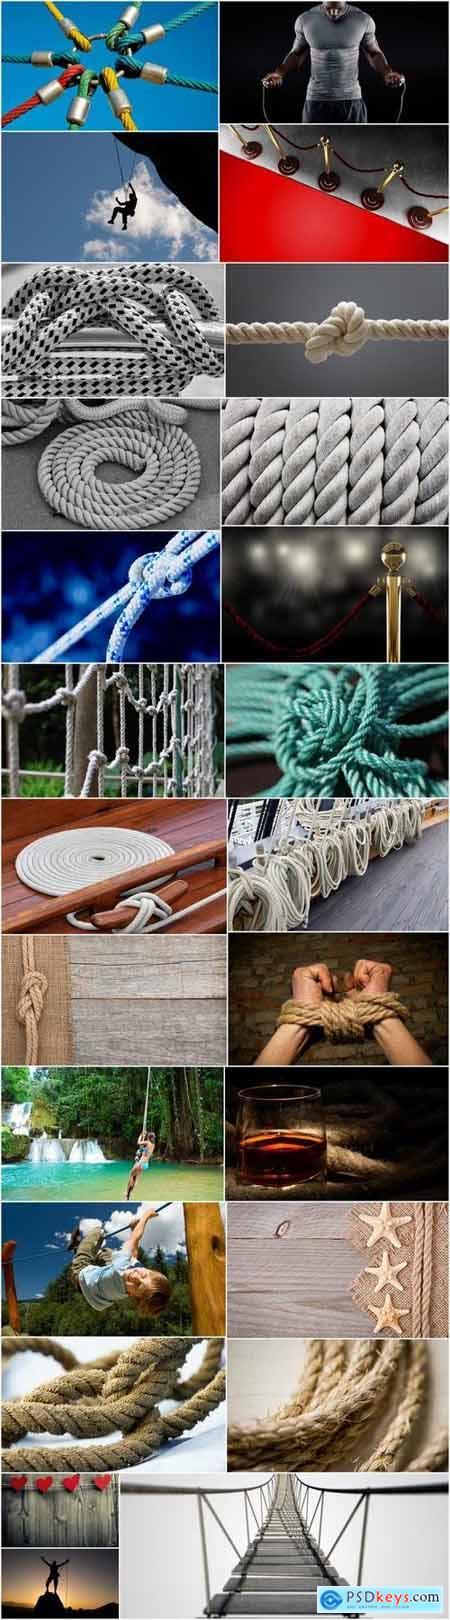 Cord a rope thread 25 HQ Jpeg